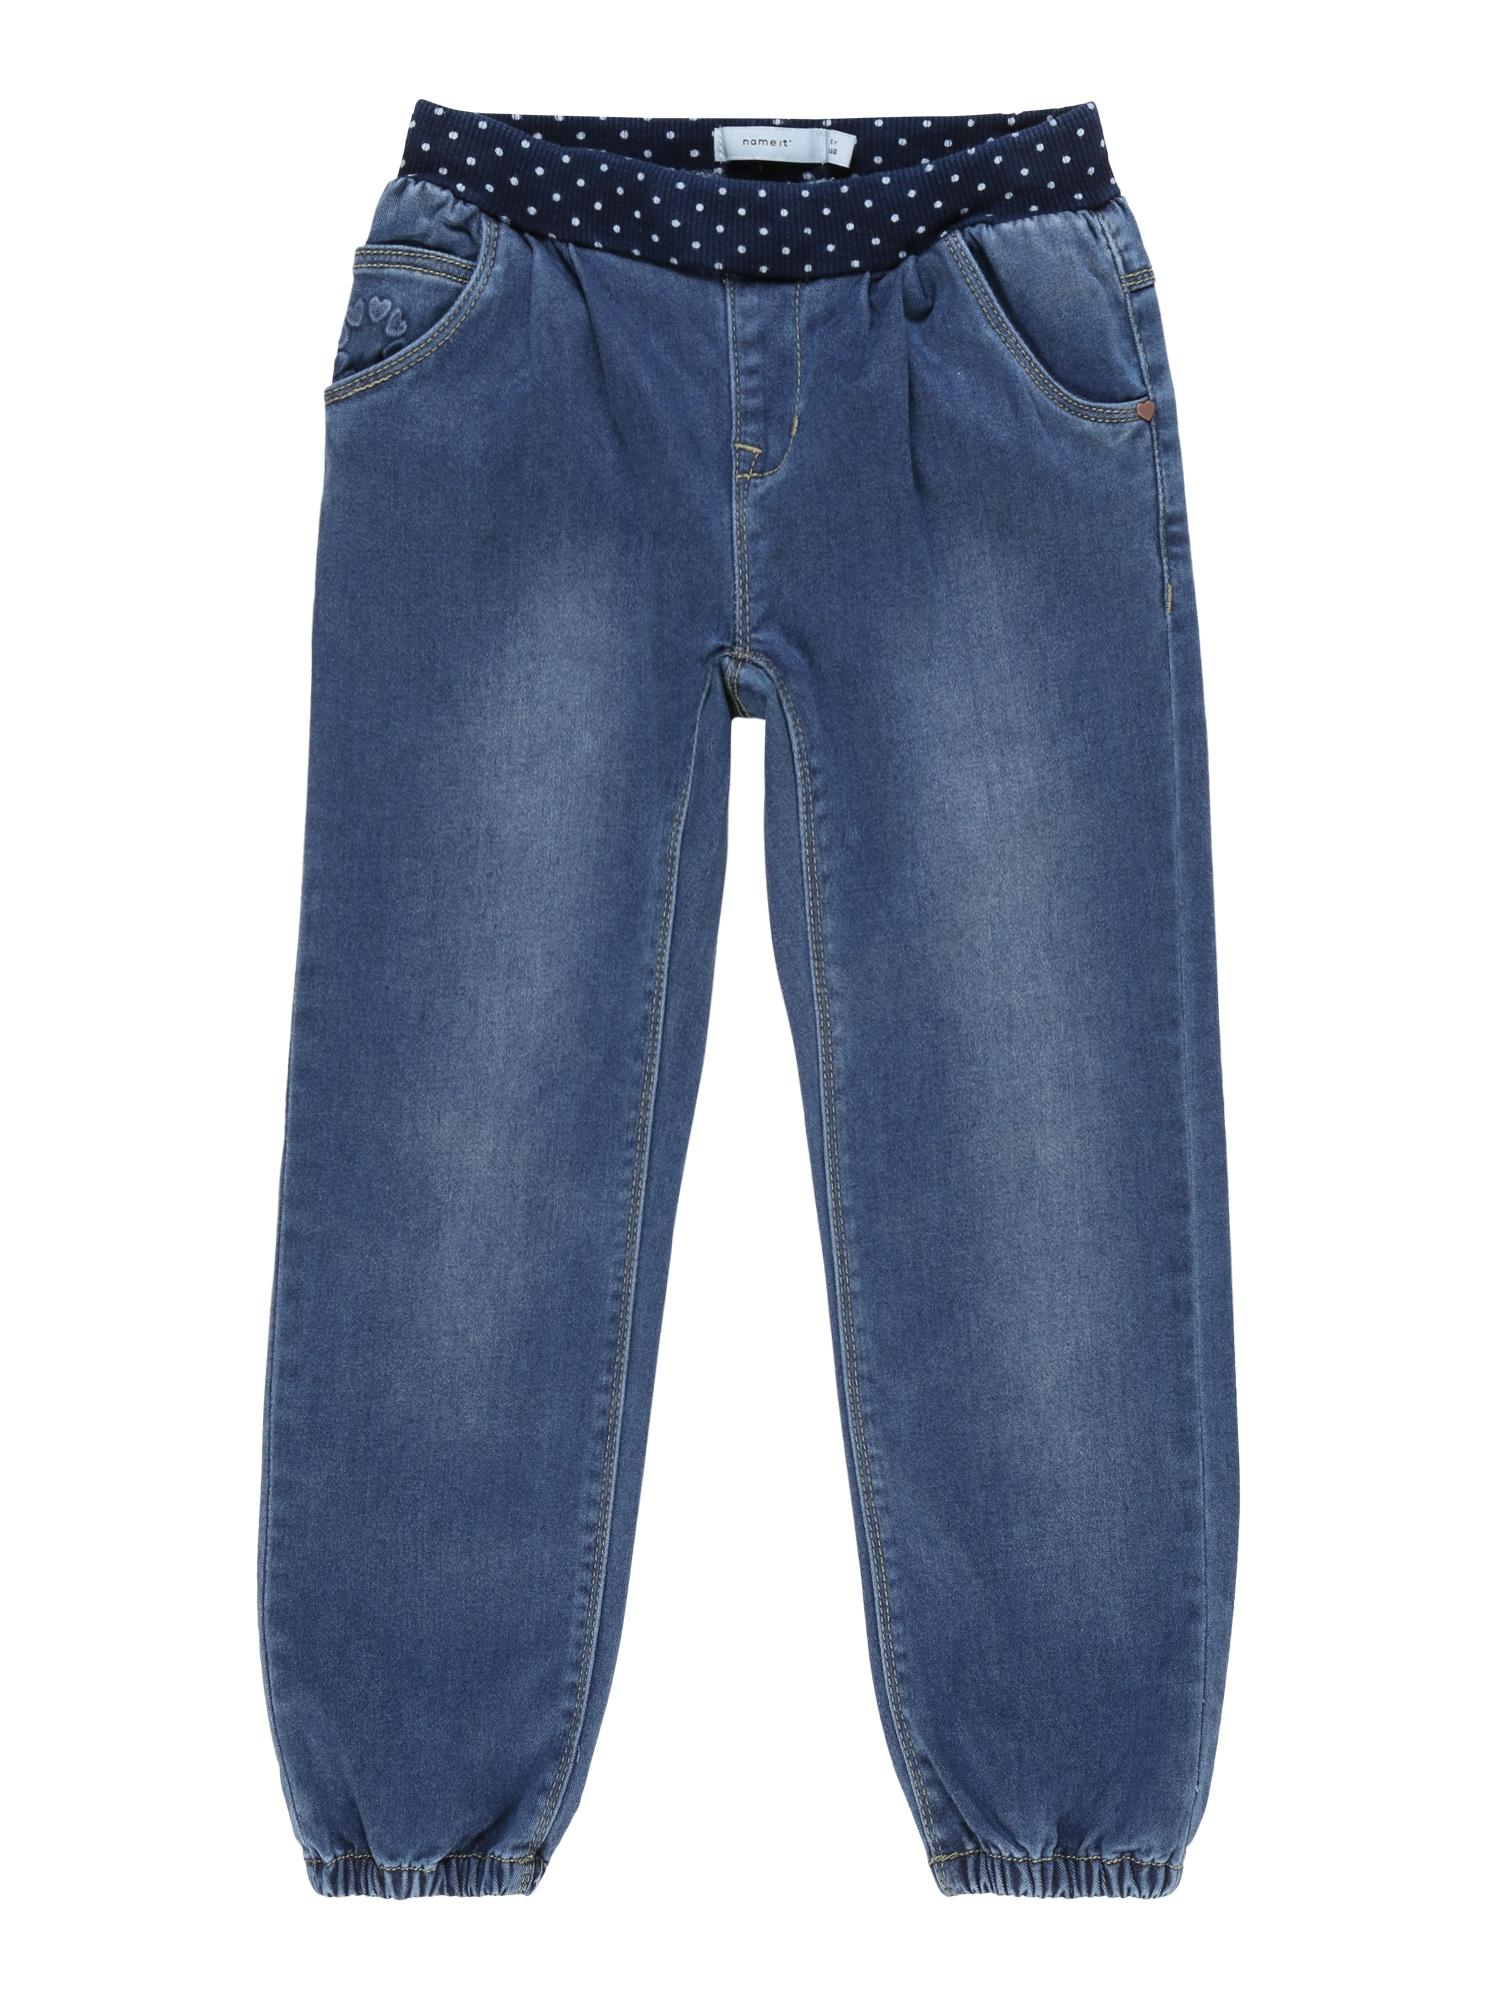 NAME IT Džinsai nakties mėlyna / tamsiai (džinso) mėlyna / natūrali balta